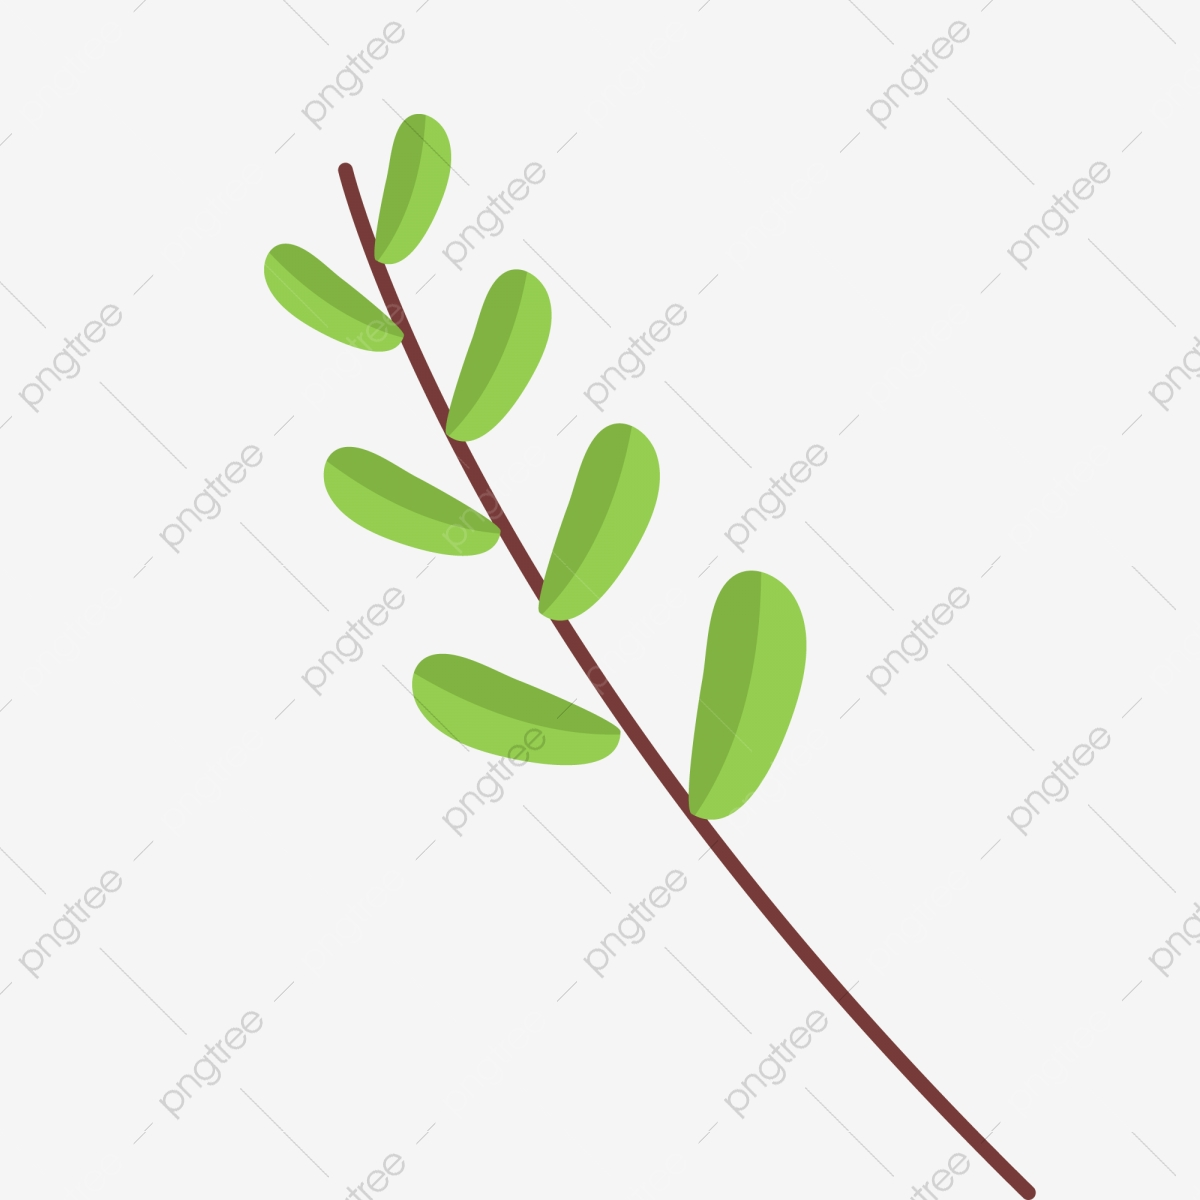 Branches D Arbres De Dessin Anime Branches De Plantes Plantes De